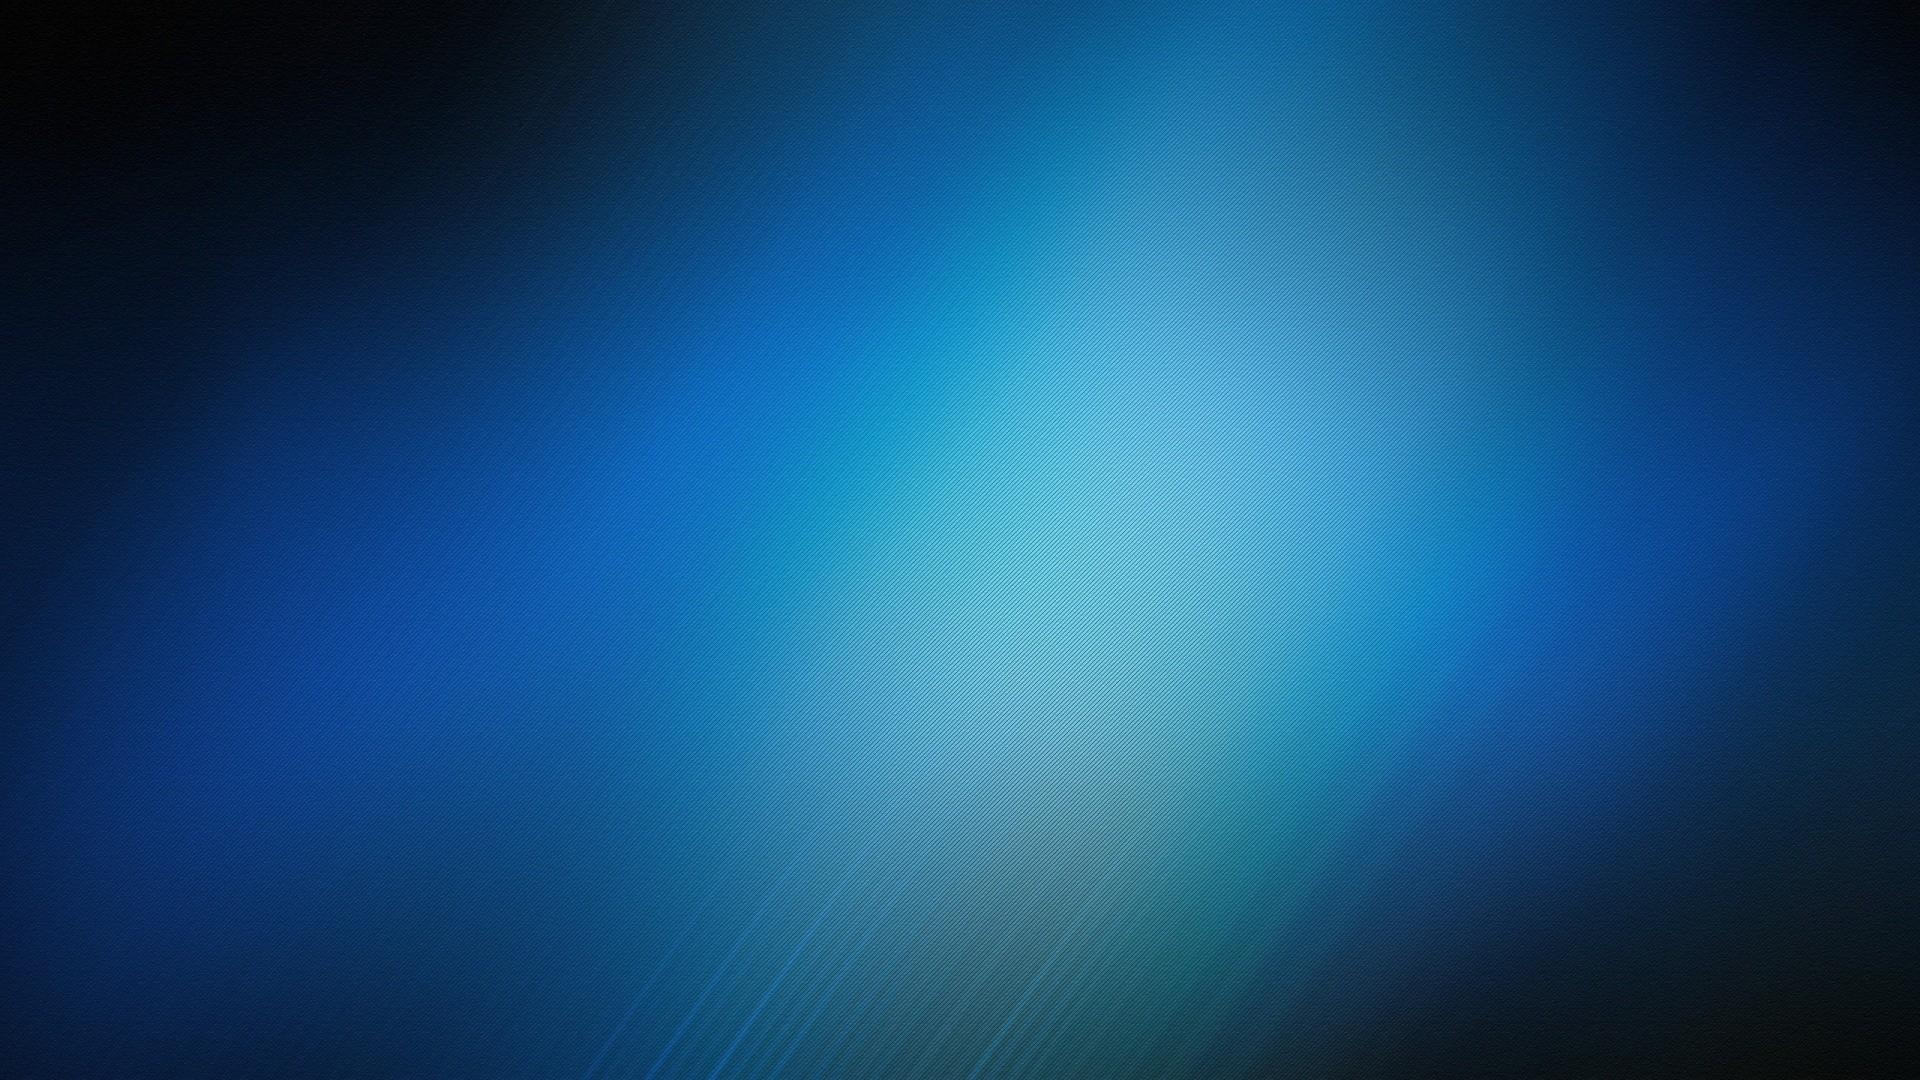 Blue Textures and Light desktop PC and Mac wallpaper